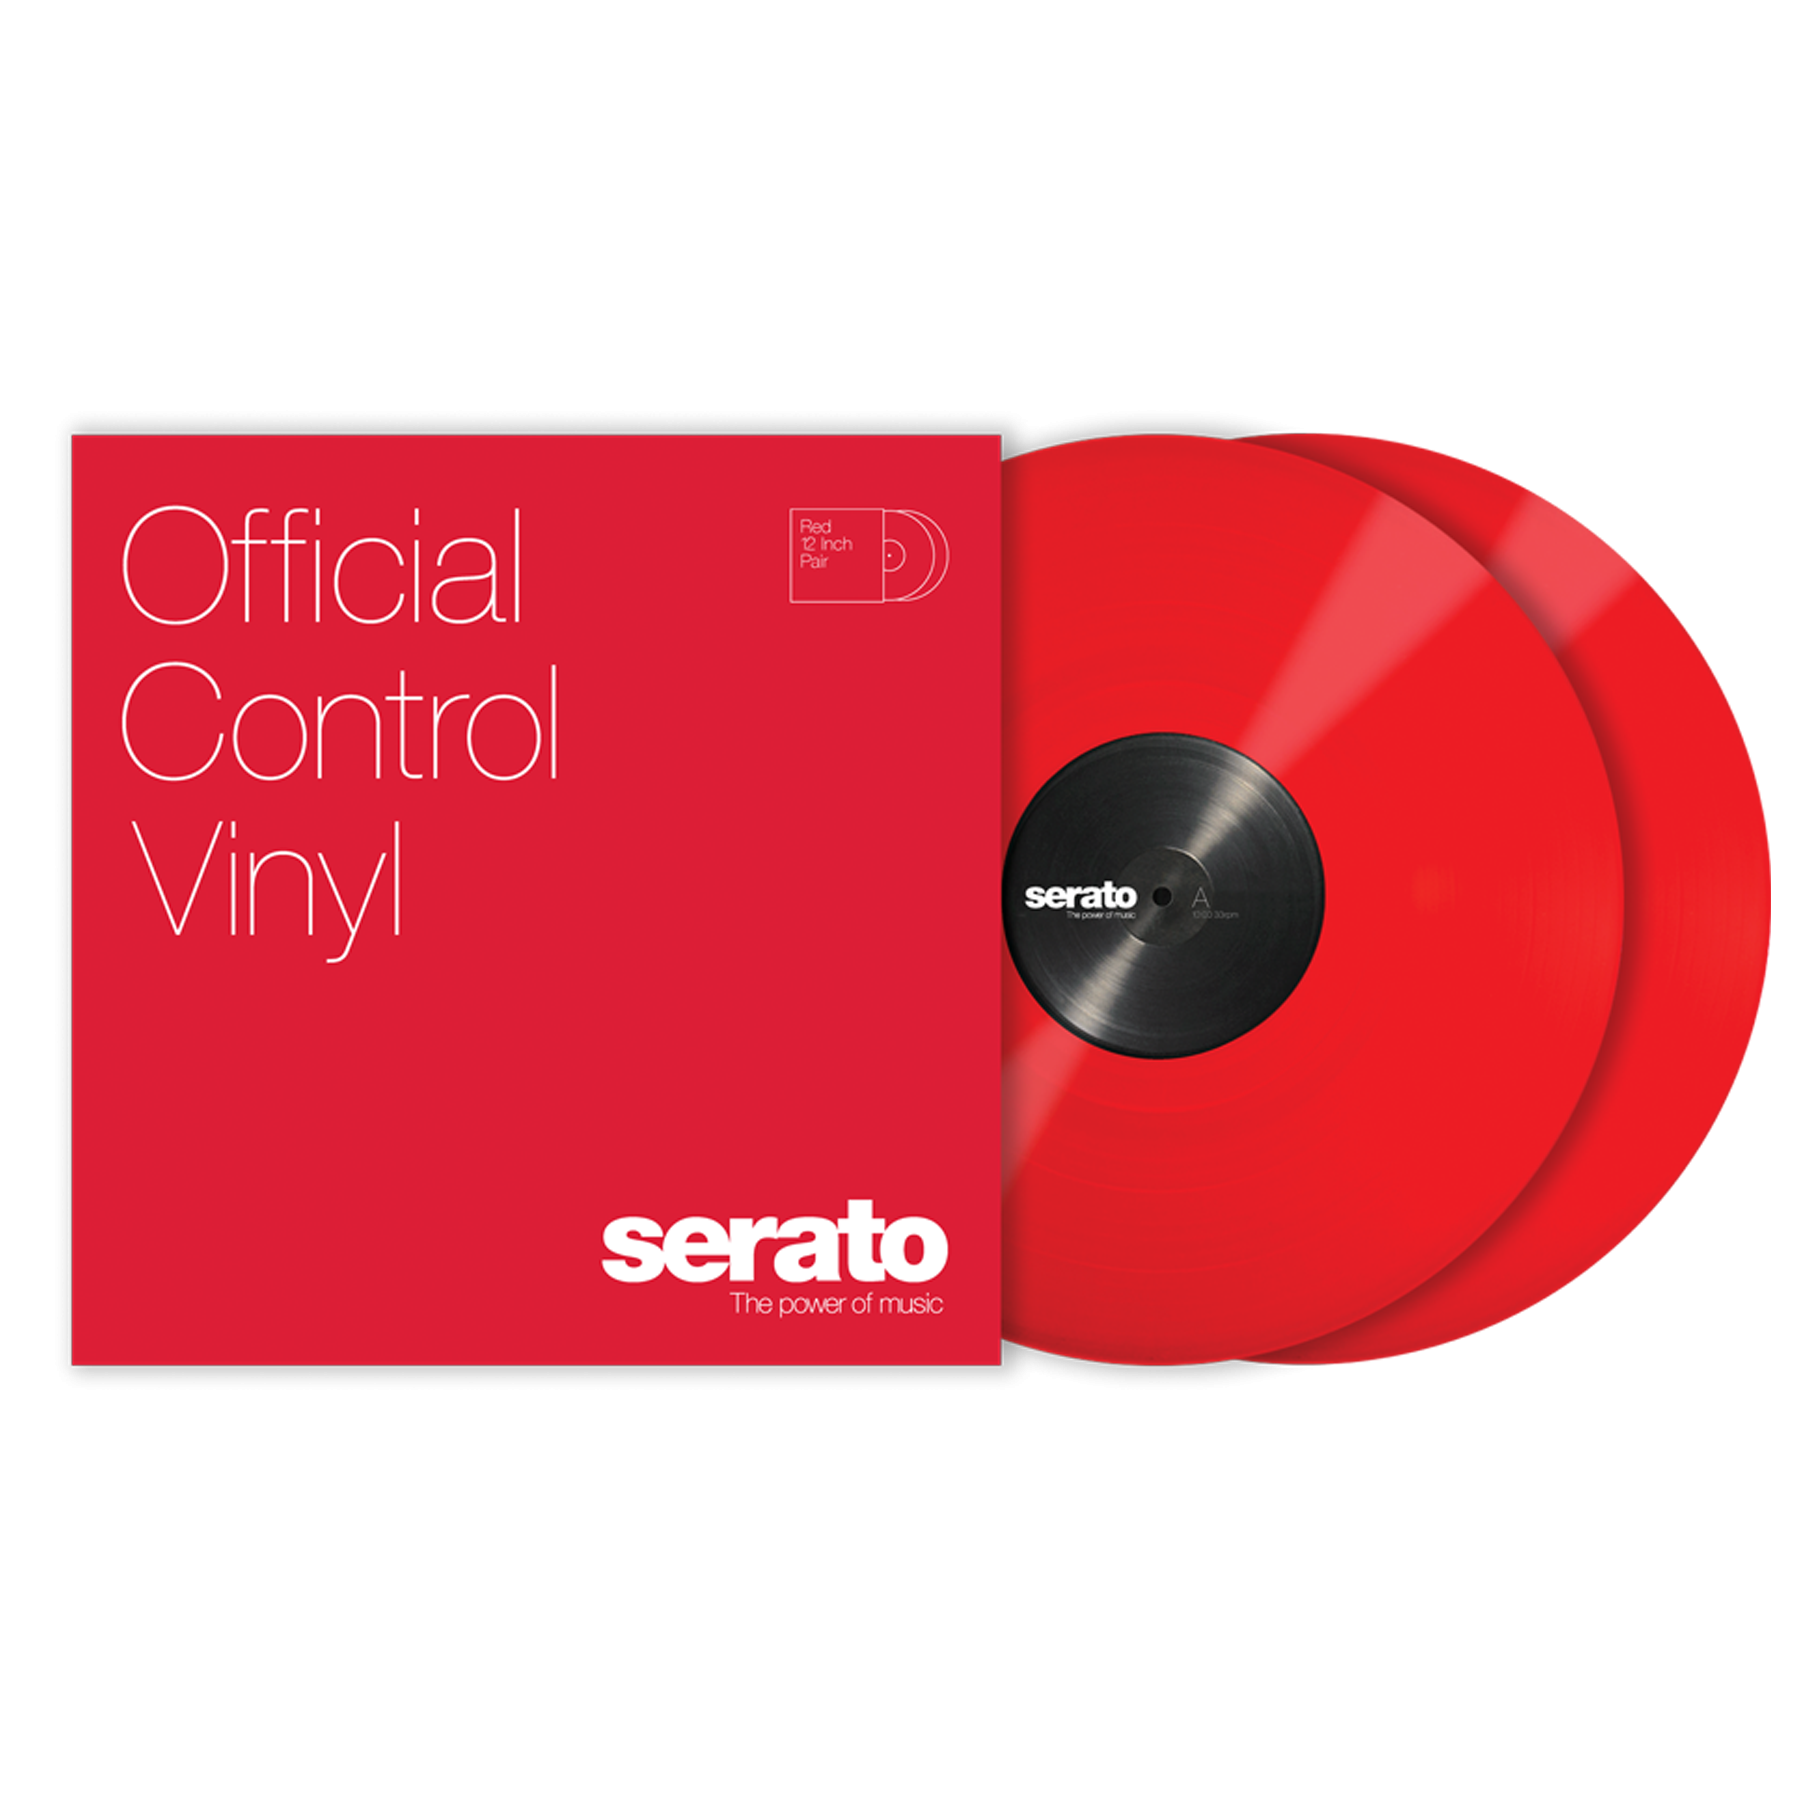 Serato Control Vinyl Performance Red